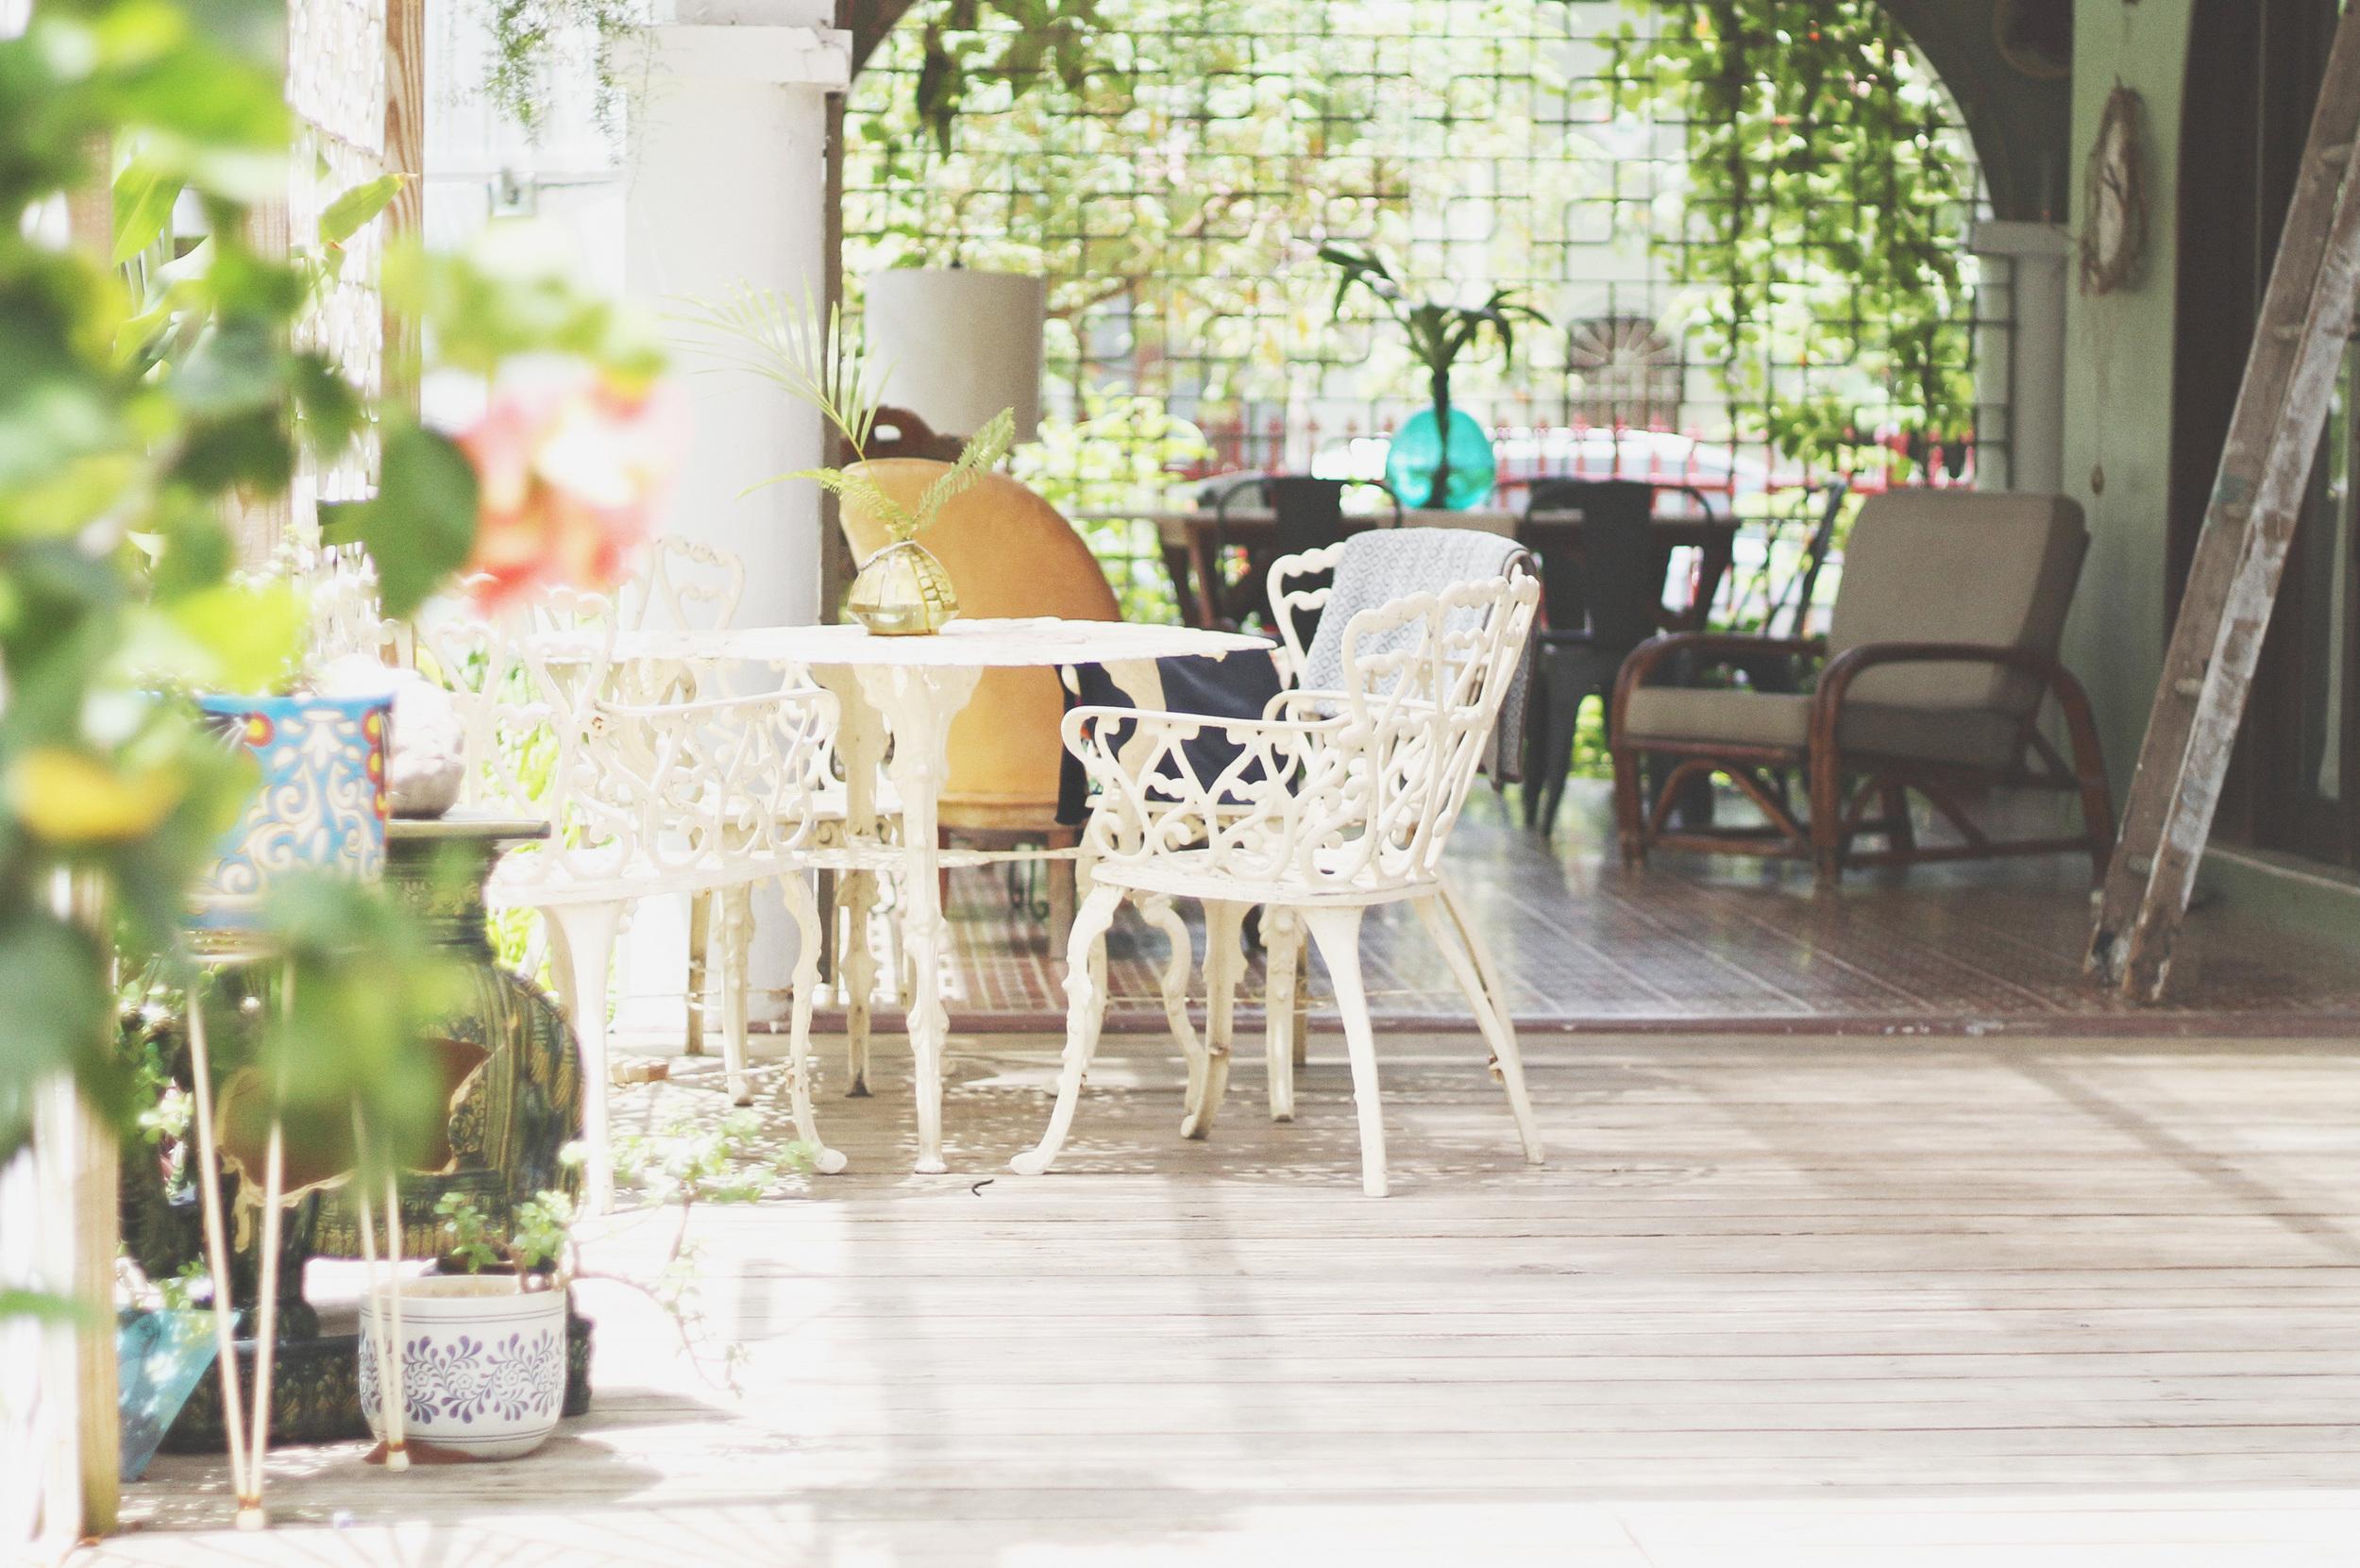 dreamcatcher guesthouse puerto rico | via: bekuh b.